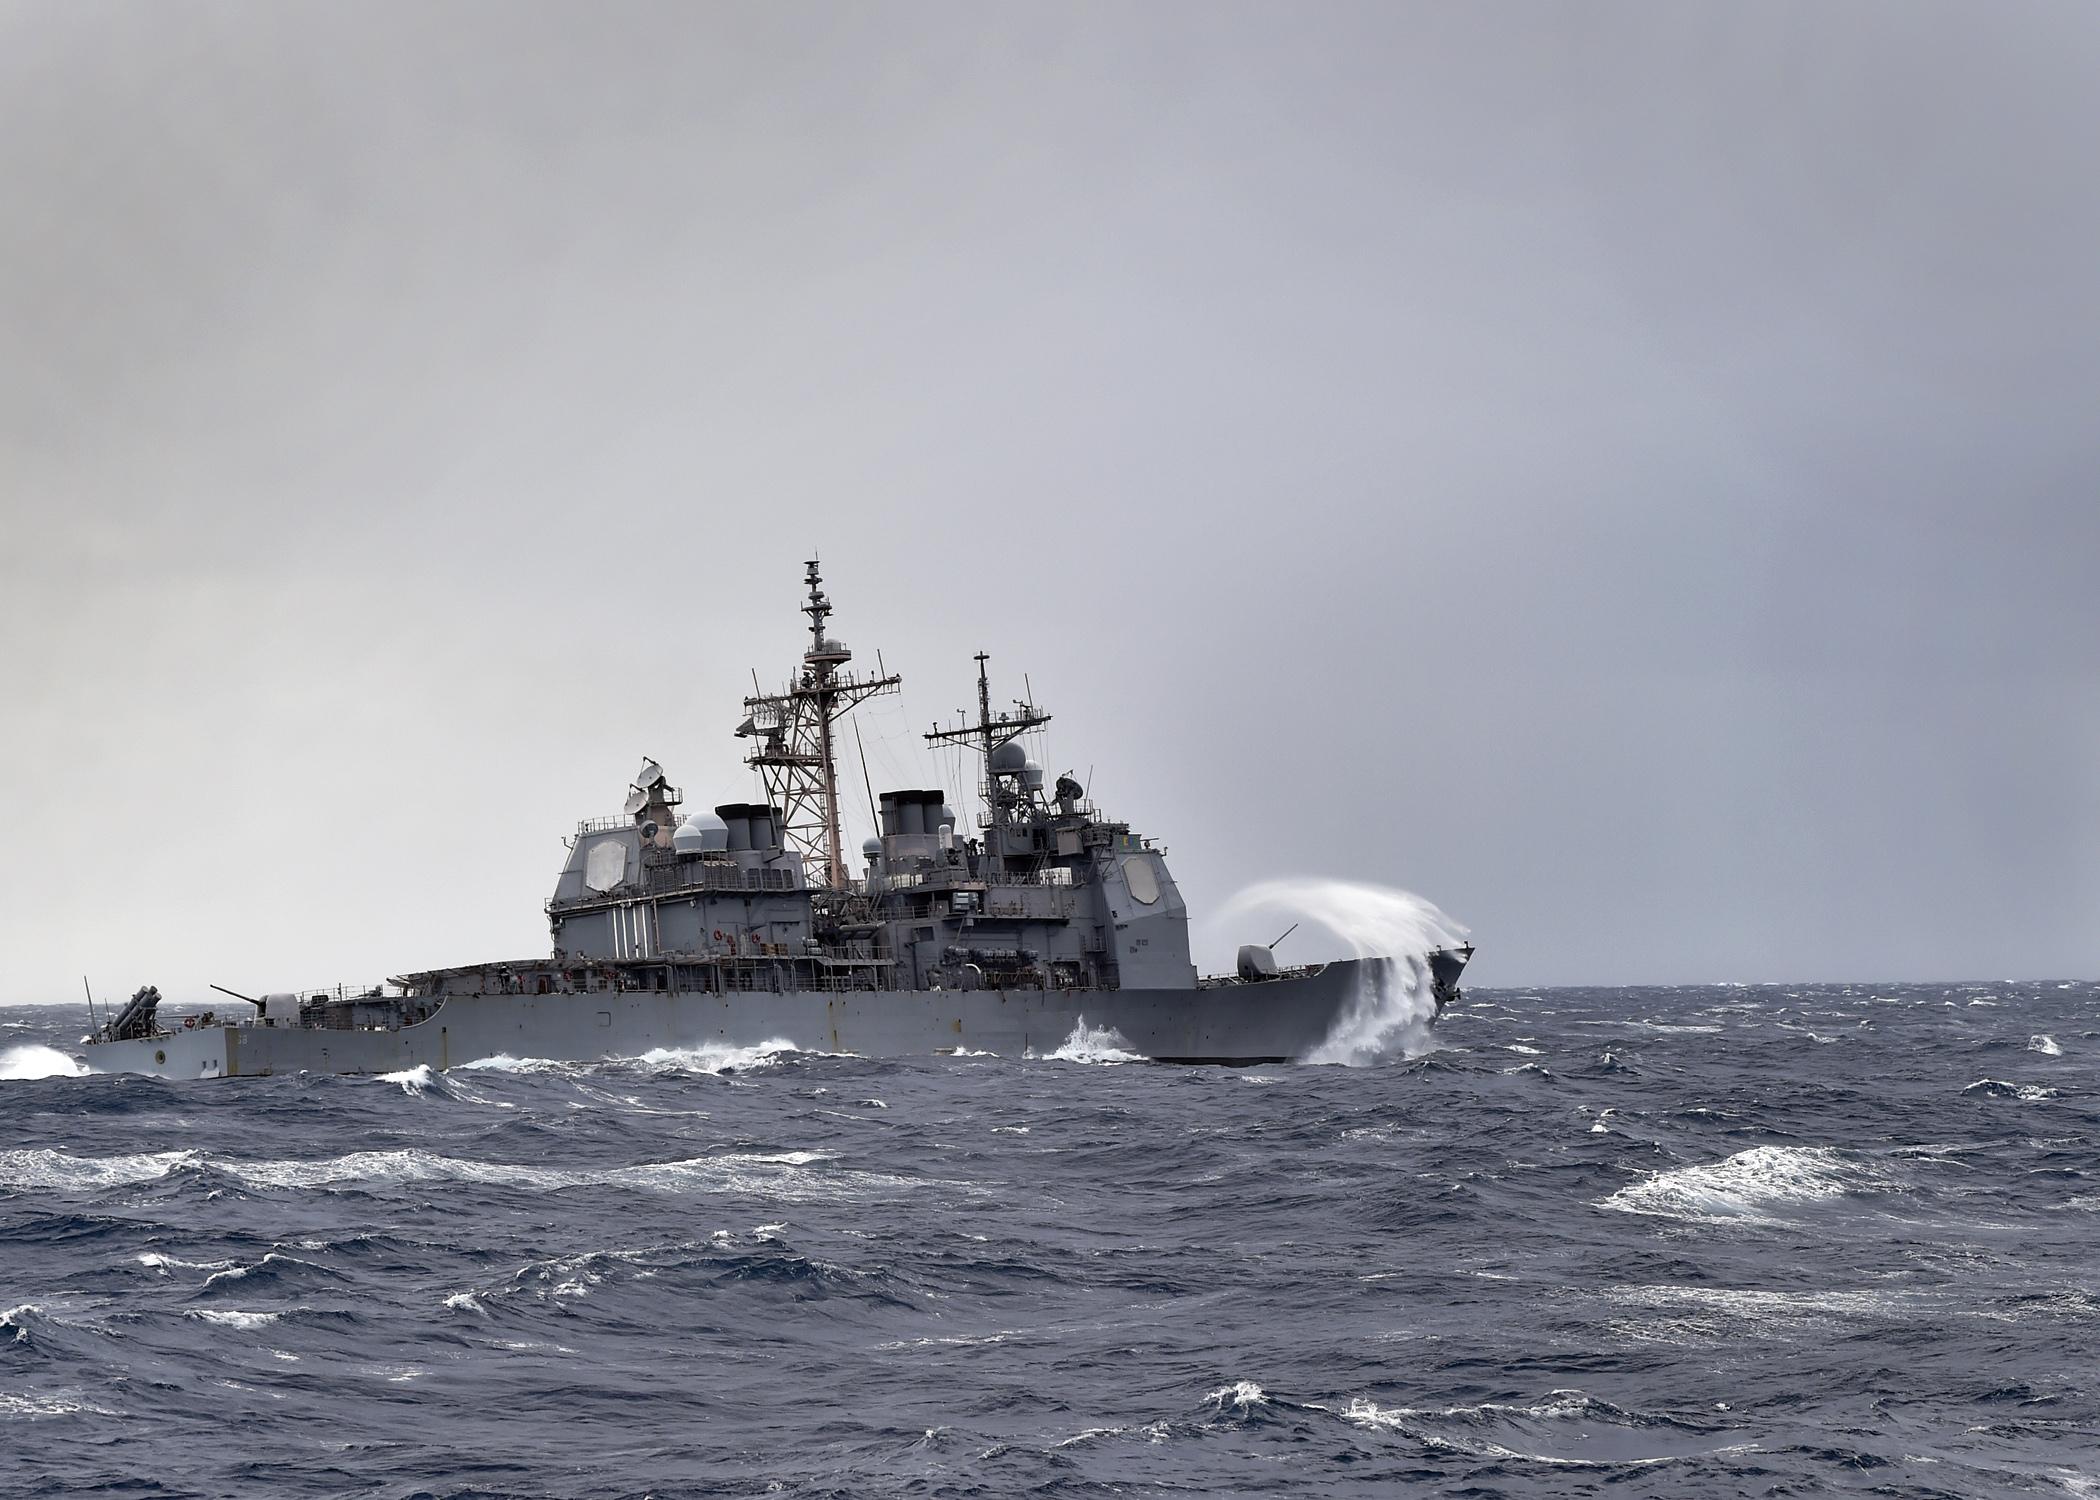 USS ANZIO CG-54 am 30.03.2015 im Atlantik Bild: U.S. Navy